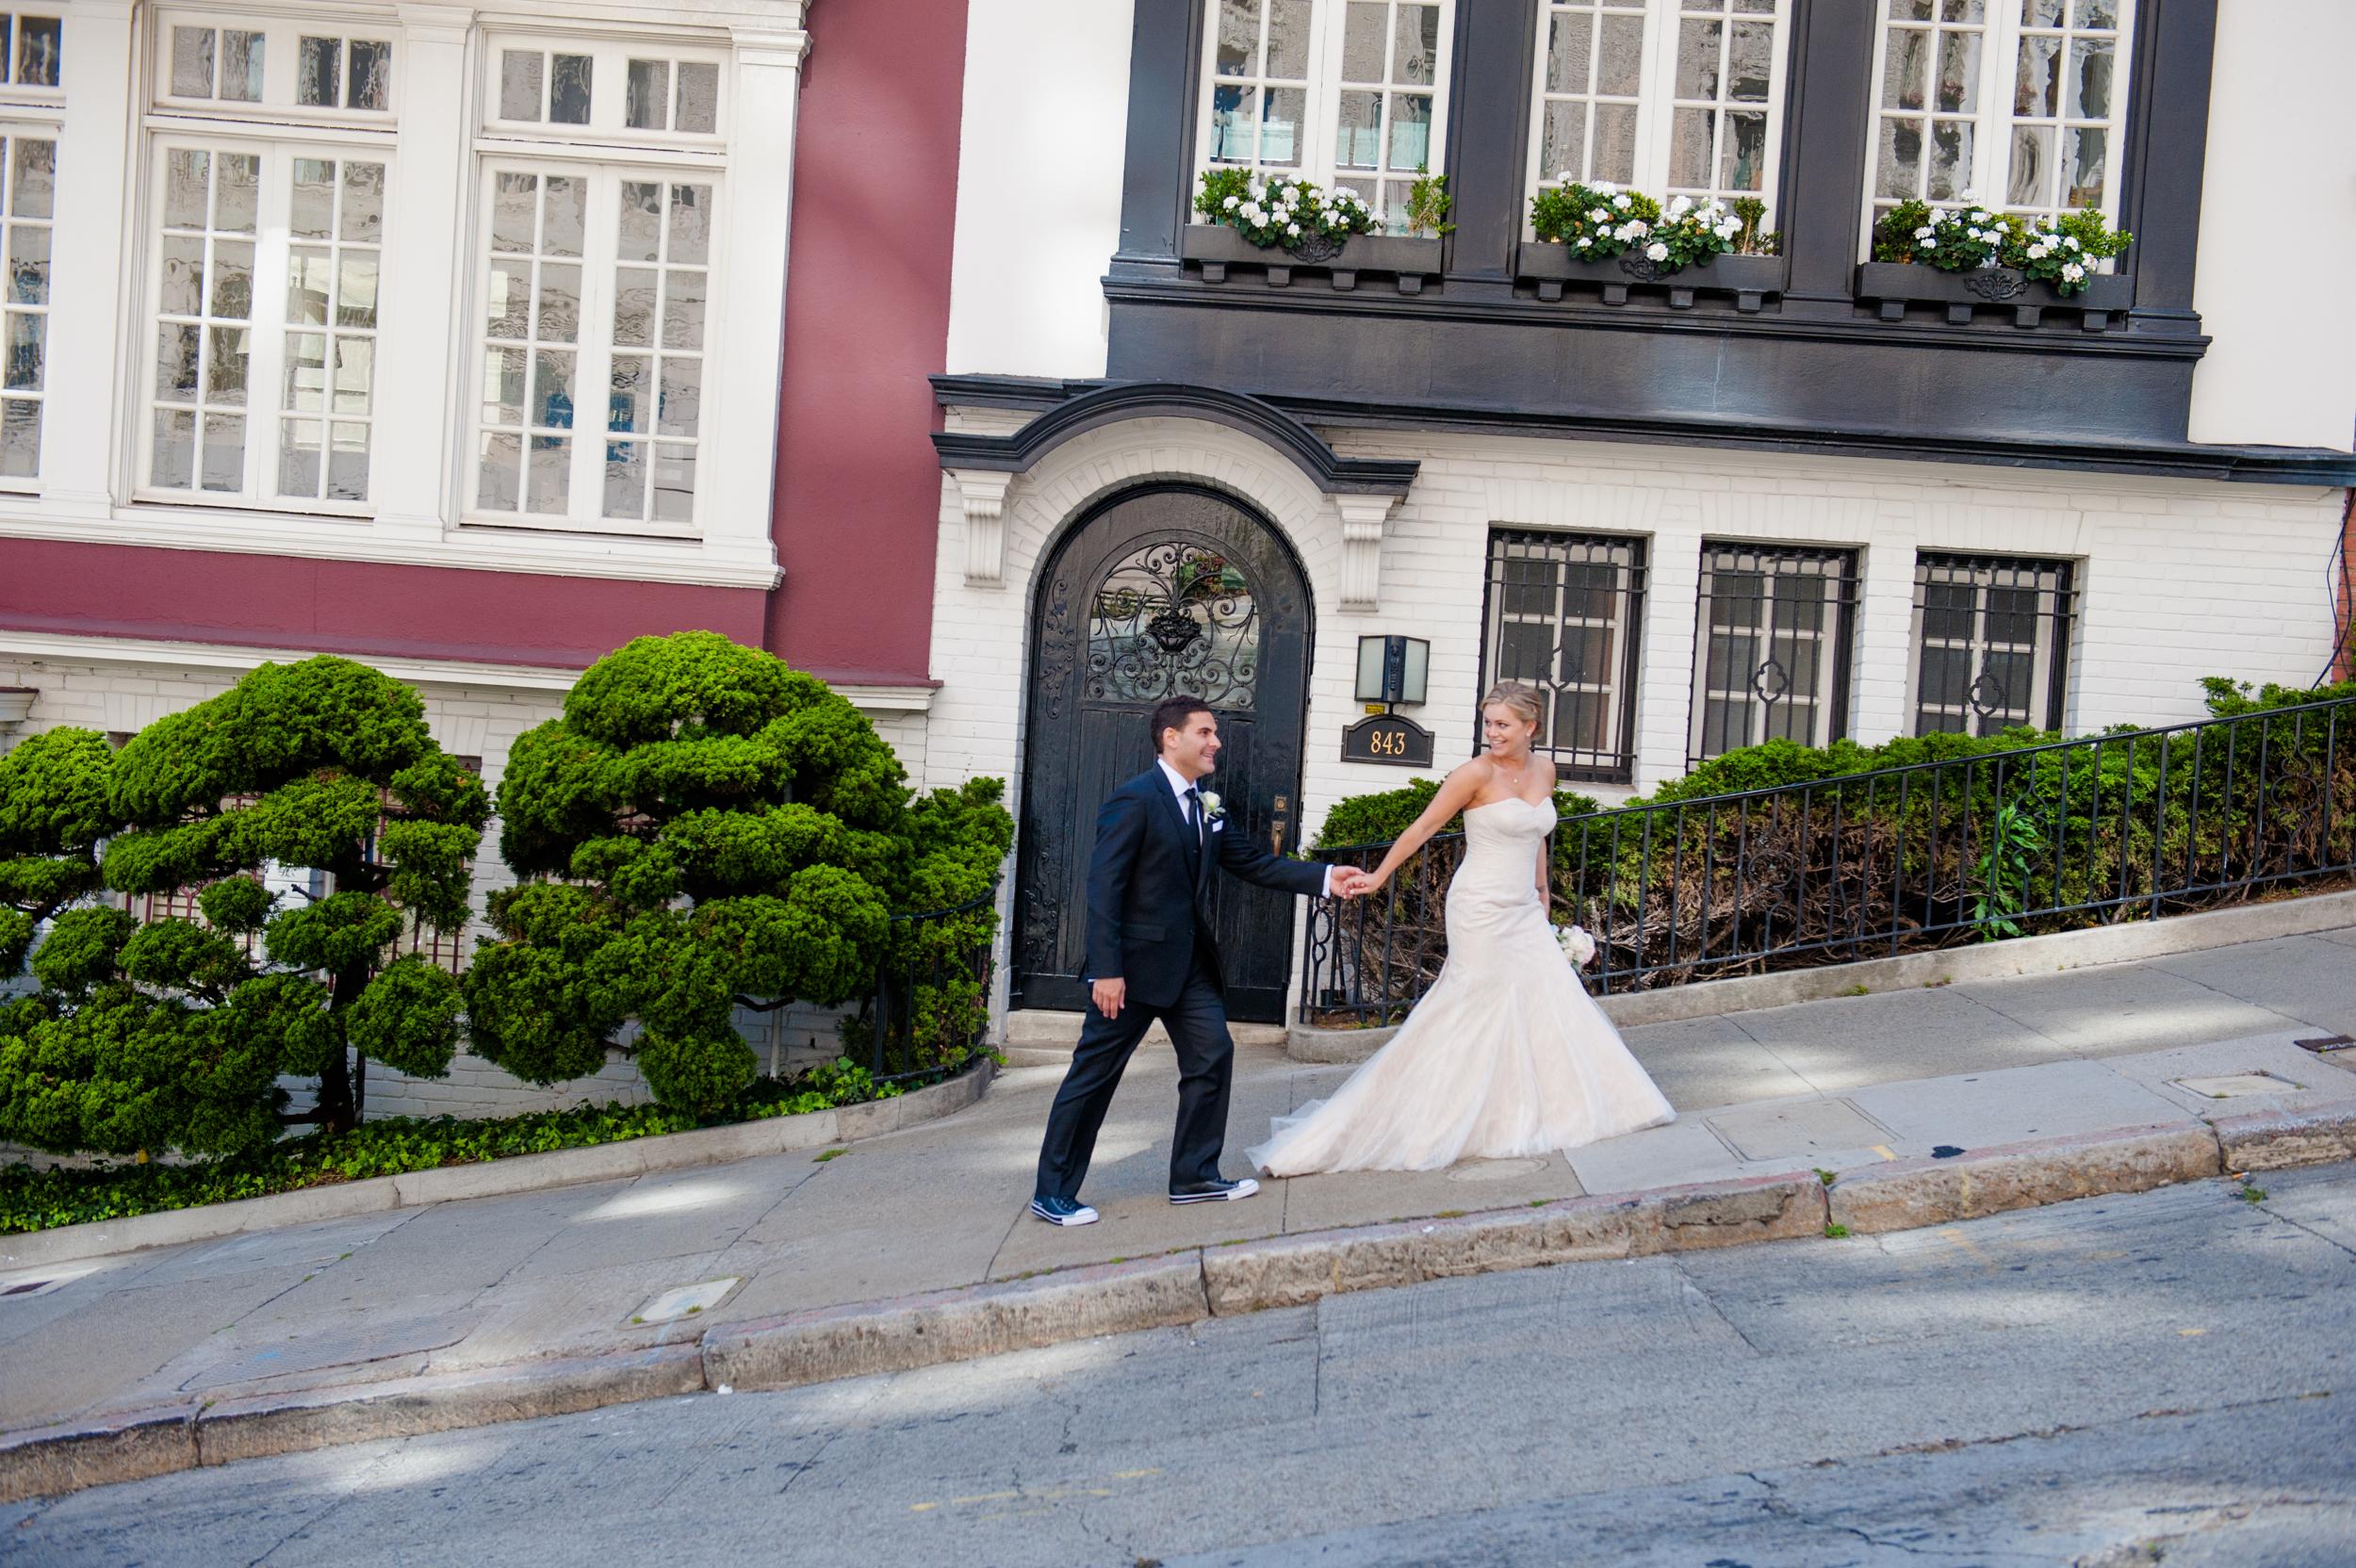 JKP-Destination-Weddings-0060.JPG